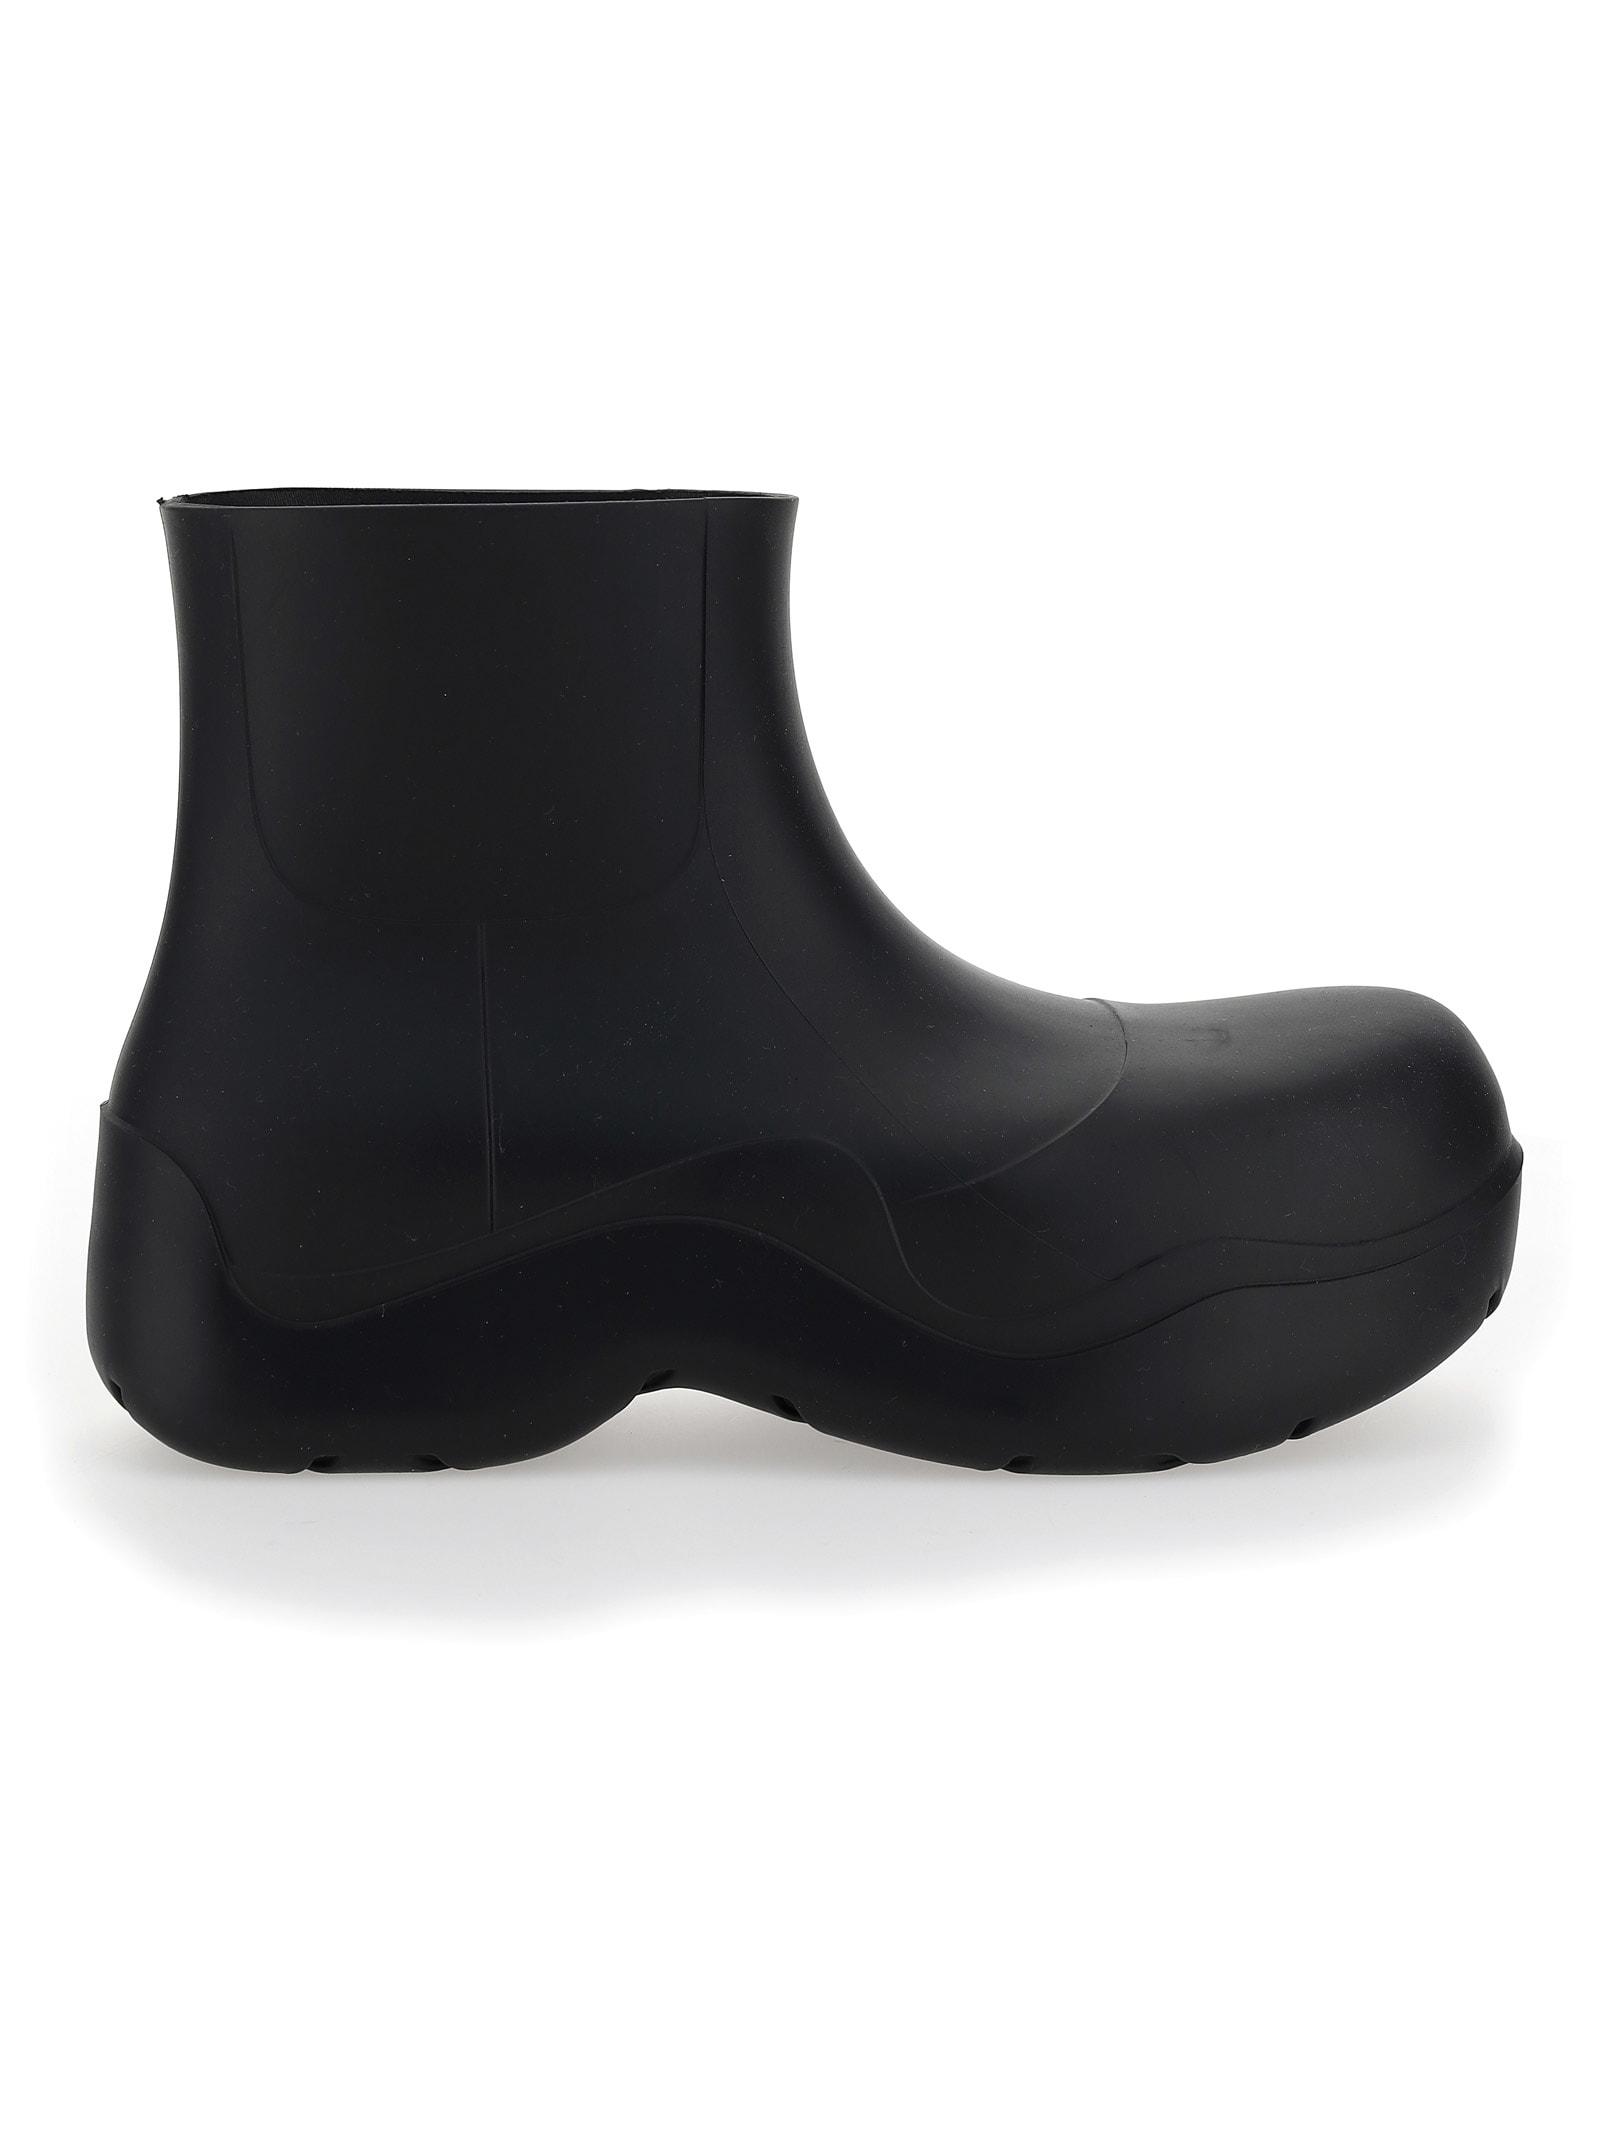 Bottega Veneta Boots BV PUDDLE BOOTS